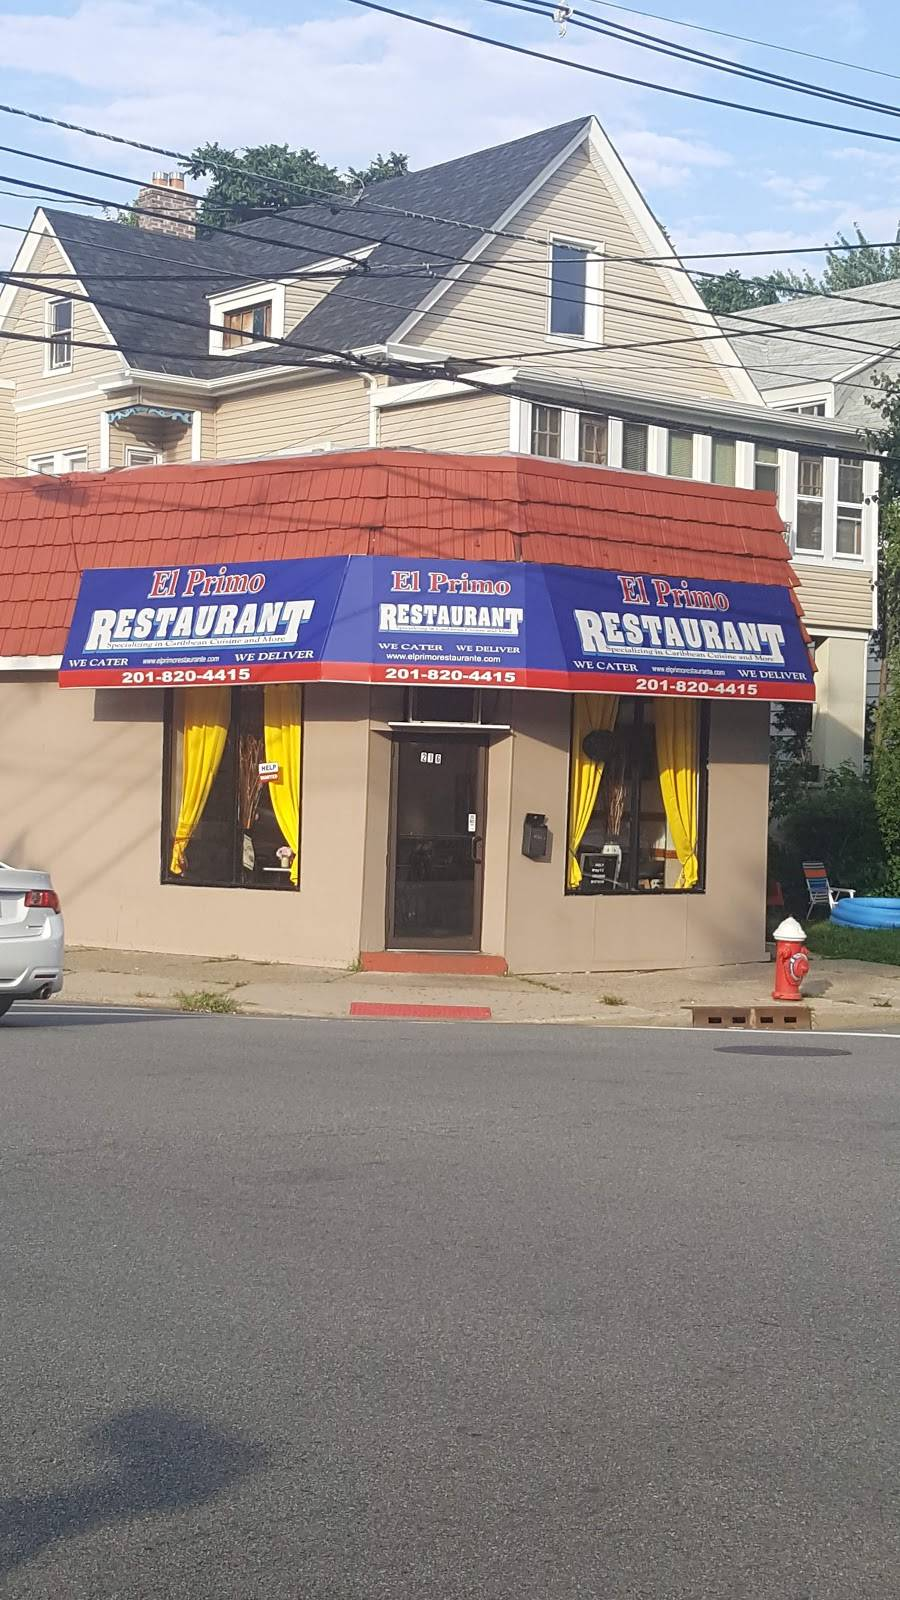 El Primo Restaurant | restaurant | 216 Central Ave, Hackensack, NJ 07601, USA | 2018204415 OR +1 201-820-4415